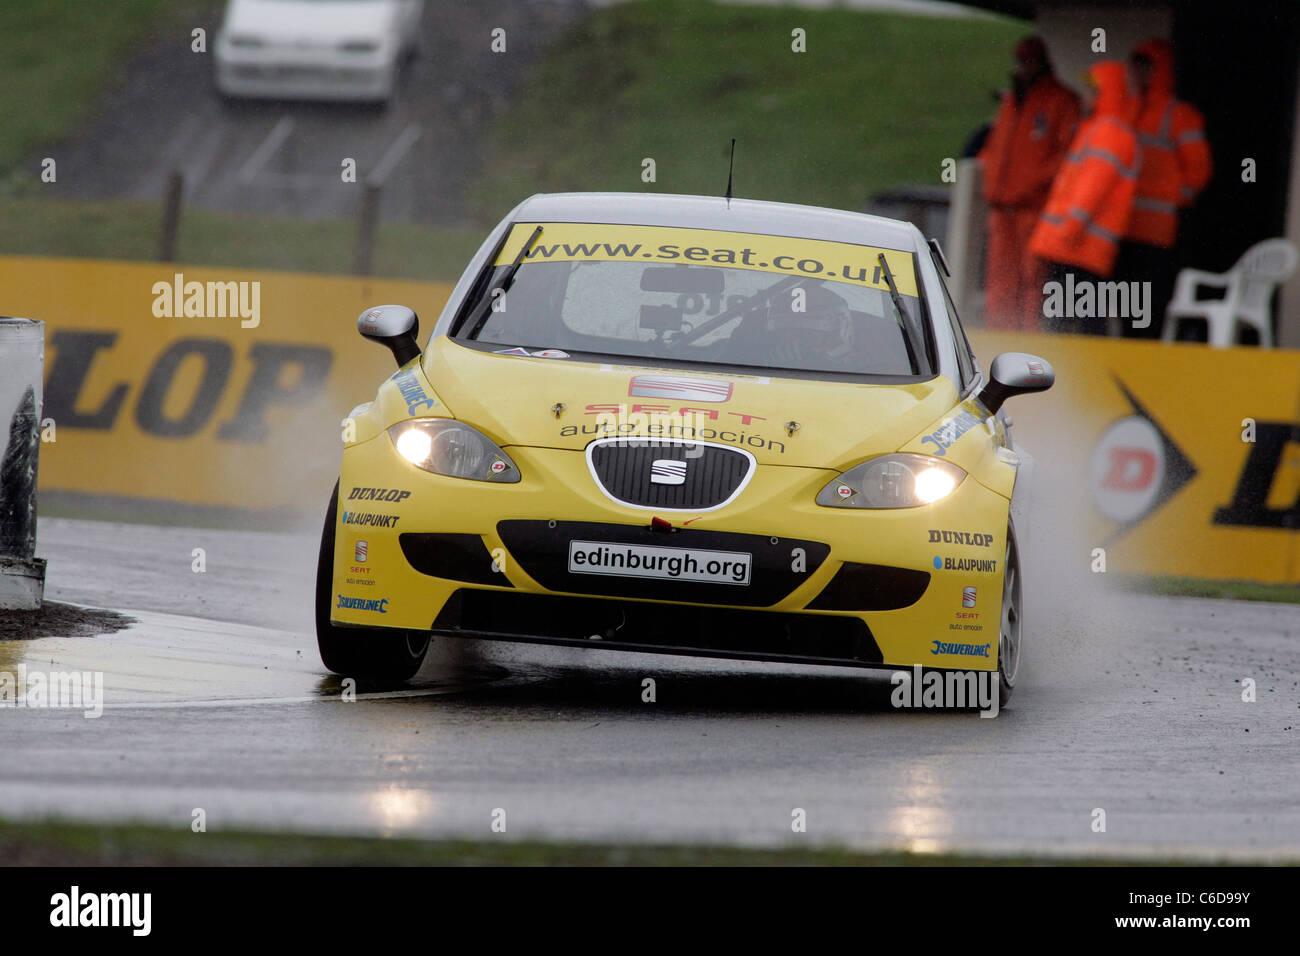 Jason Plato, British Touring Car racing driver at Knockhill Racing Circuit, Scotland - Stock Image